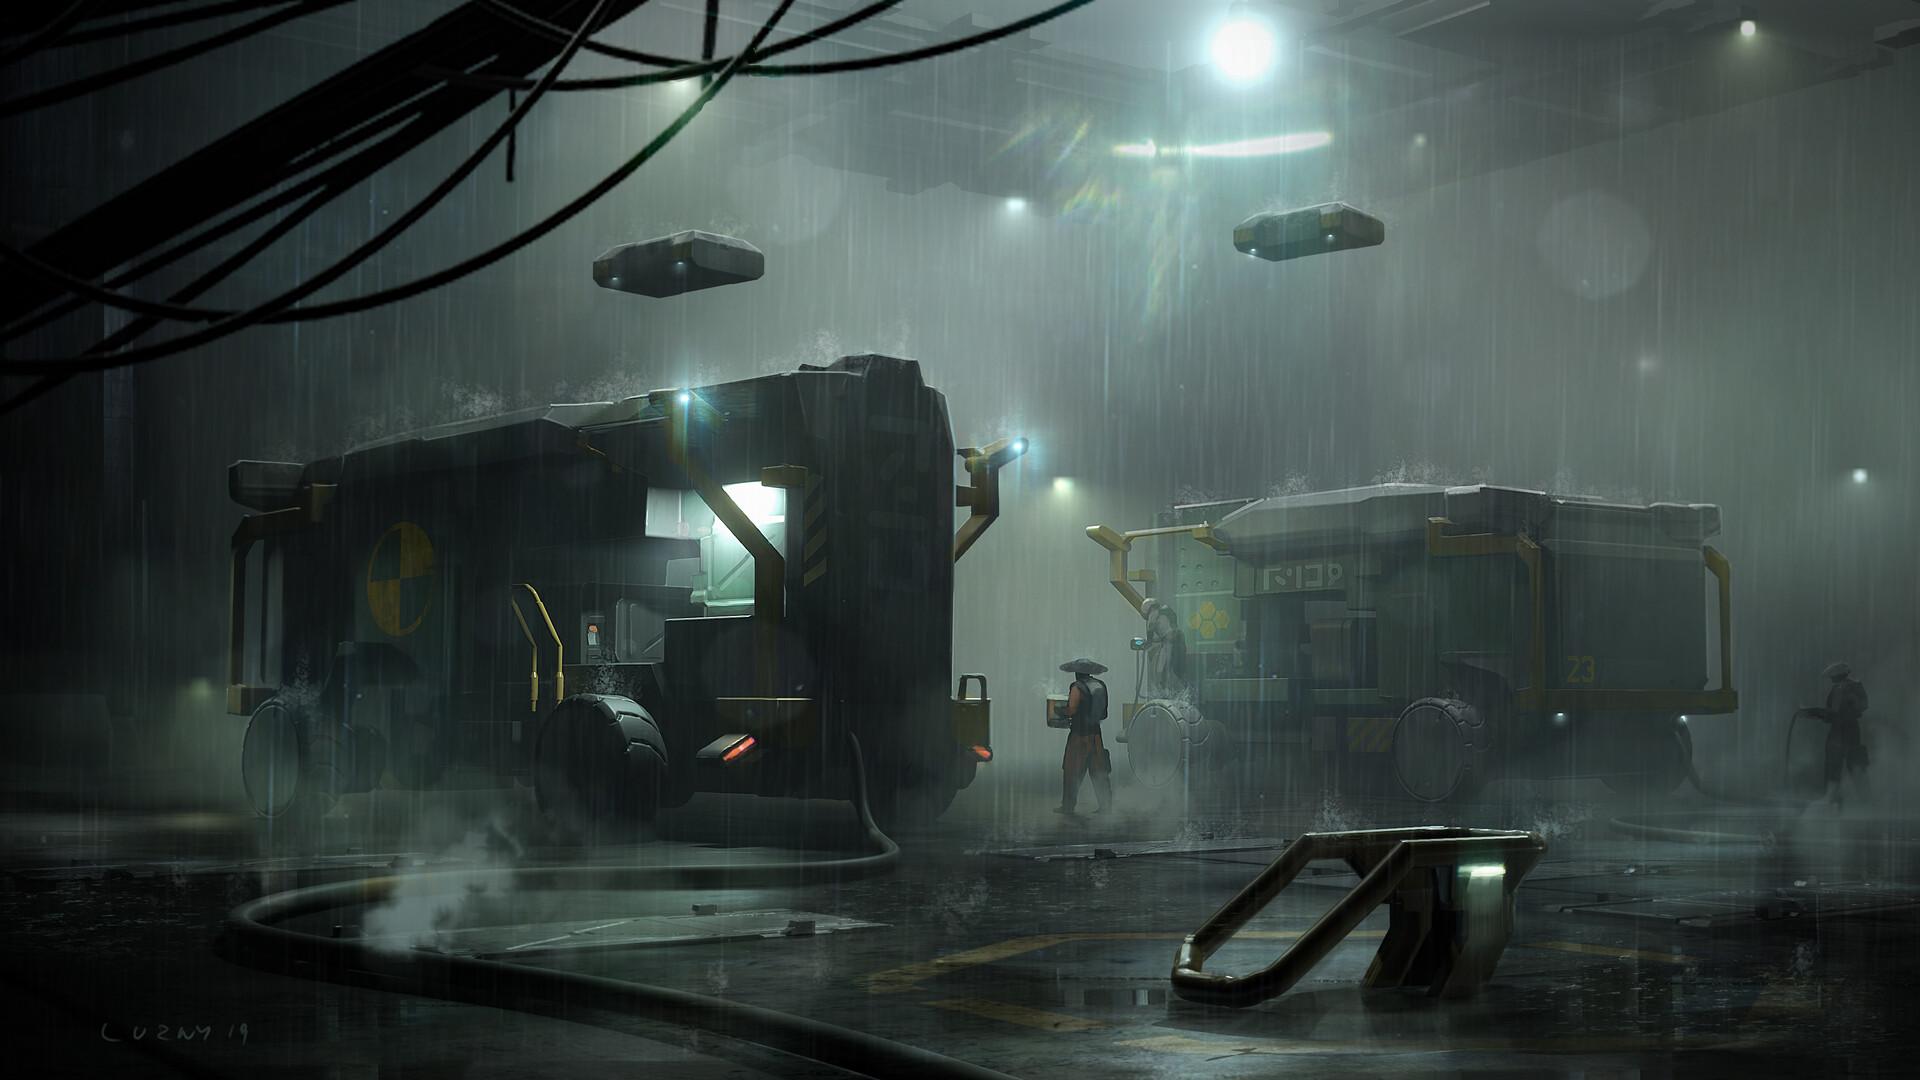 The Superb Science Fiction Art of Krzysztof Luzny